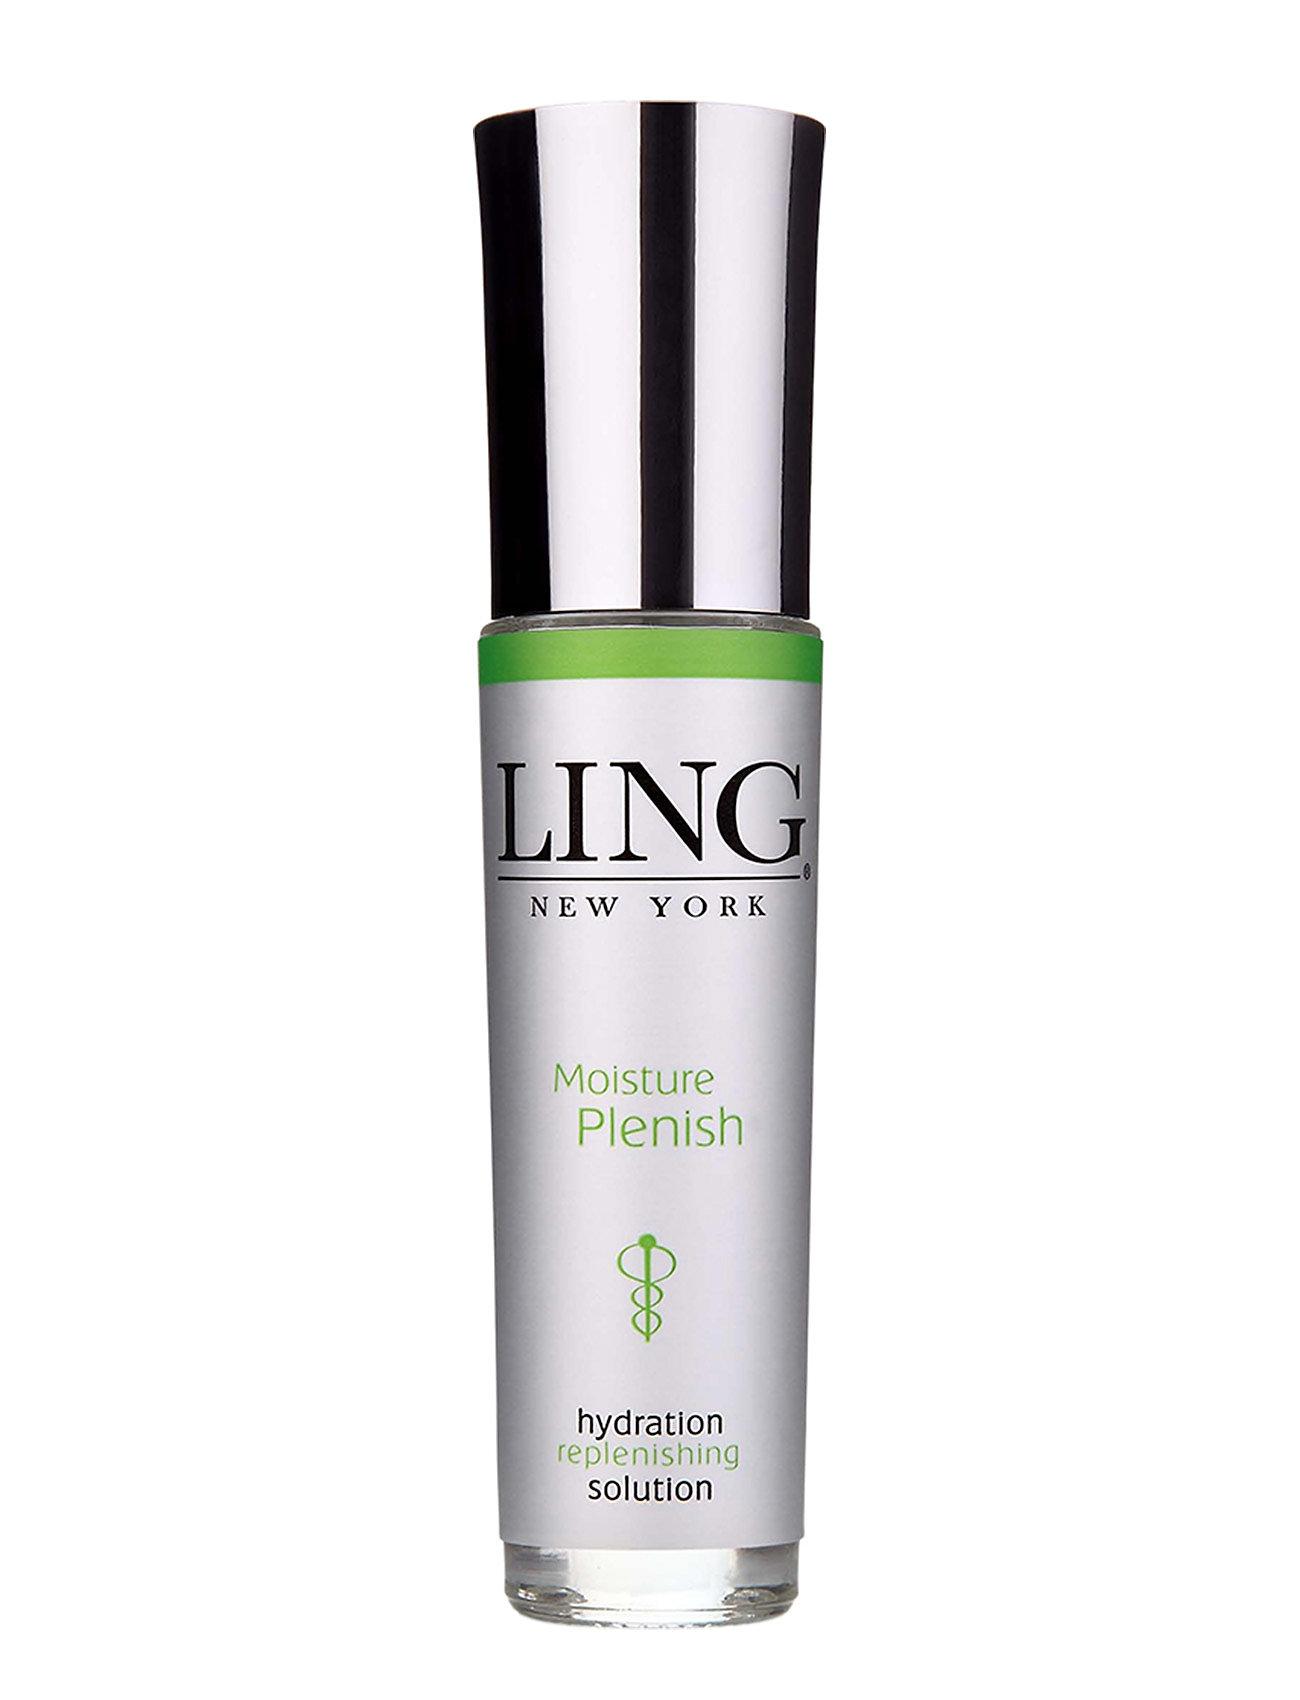 LING New York Moisture Plenish - hydration replenshing solution - CLEAR